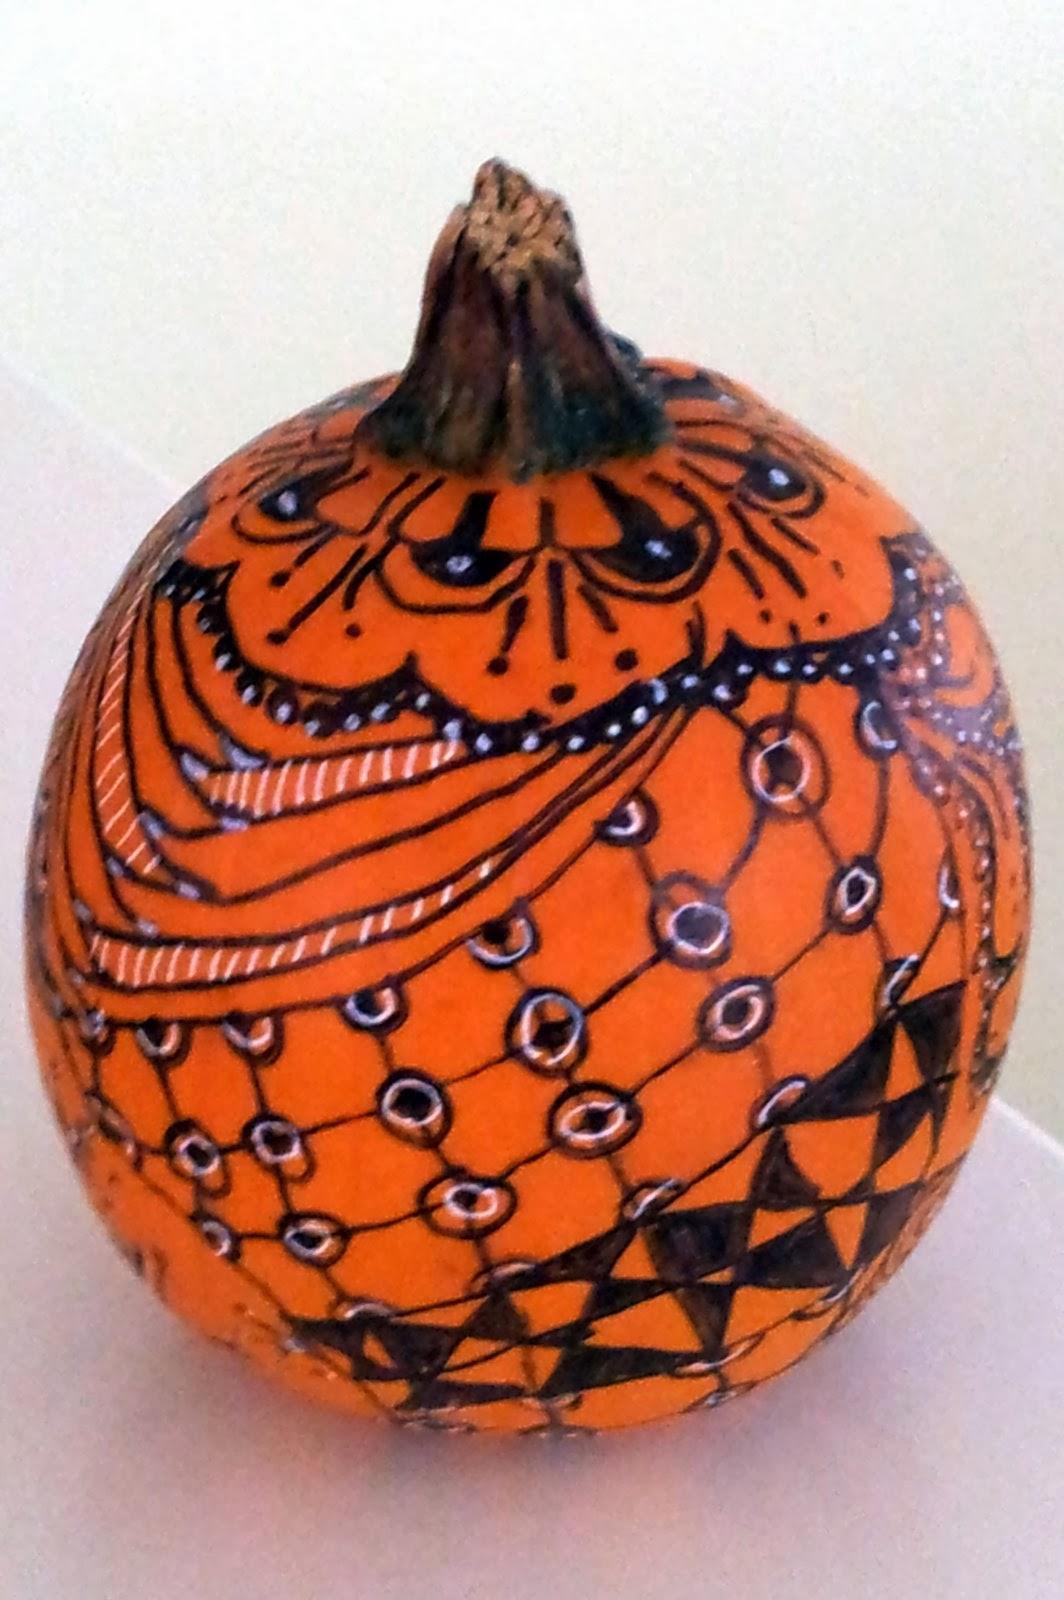 zentangle u00ae as presented by g  klein  czt  pumpkin zia